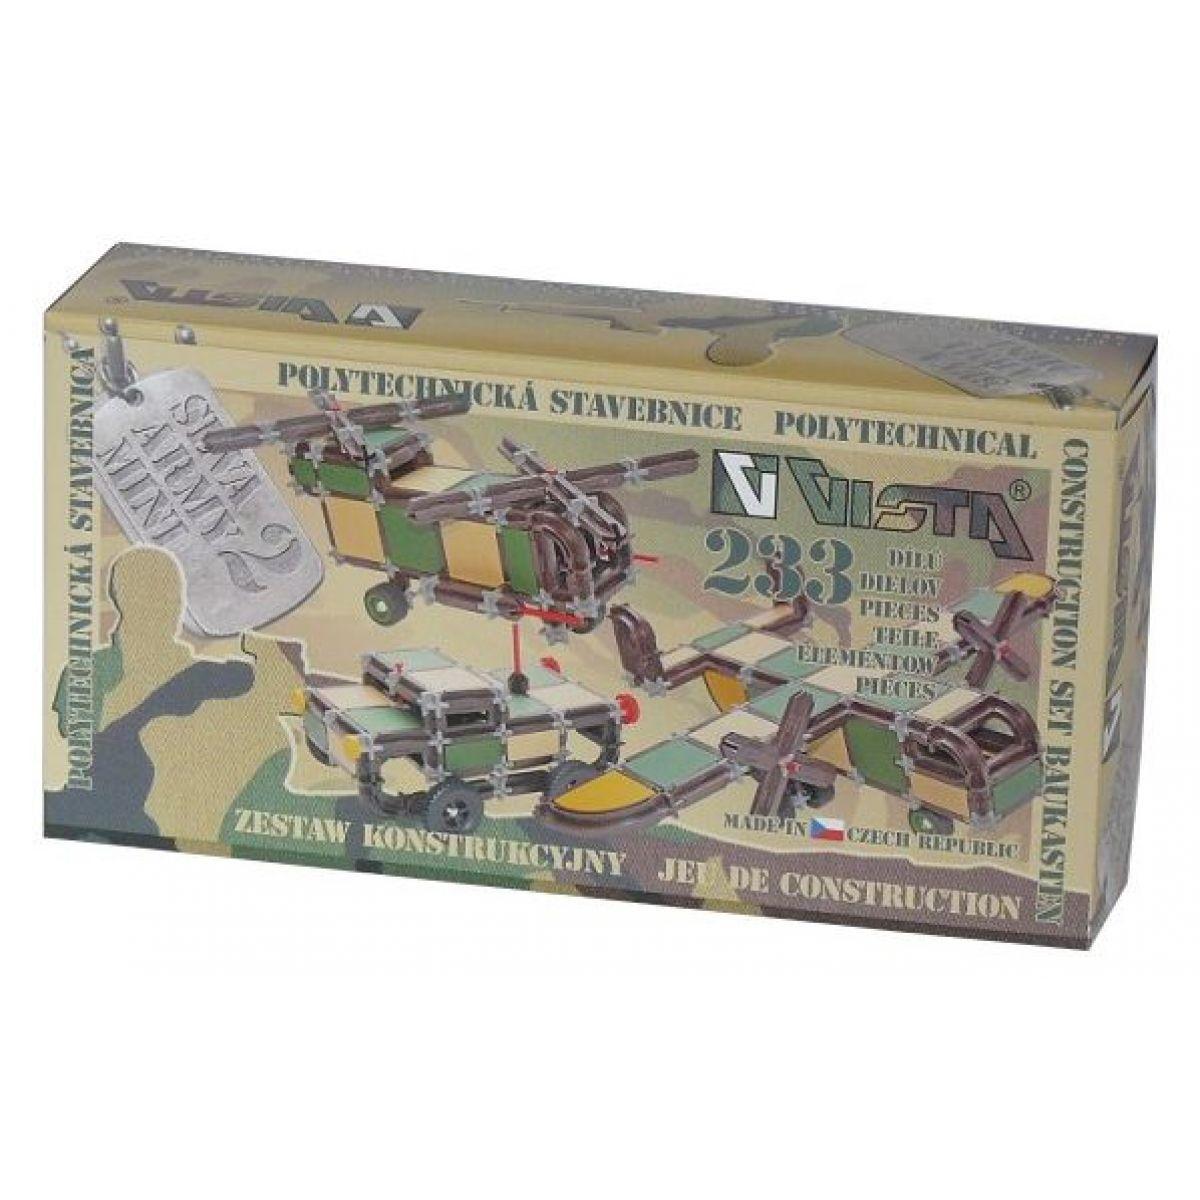 Vista Stavebnice Seva Army Mini 2 plast 233 ks v krabici